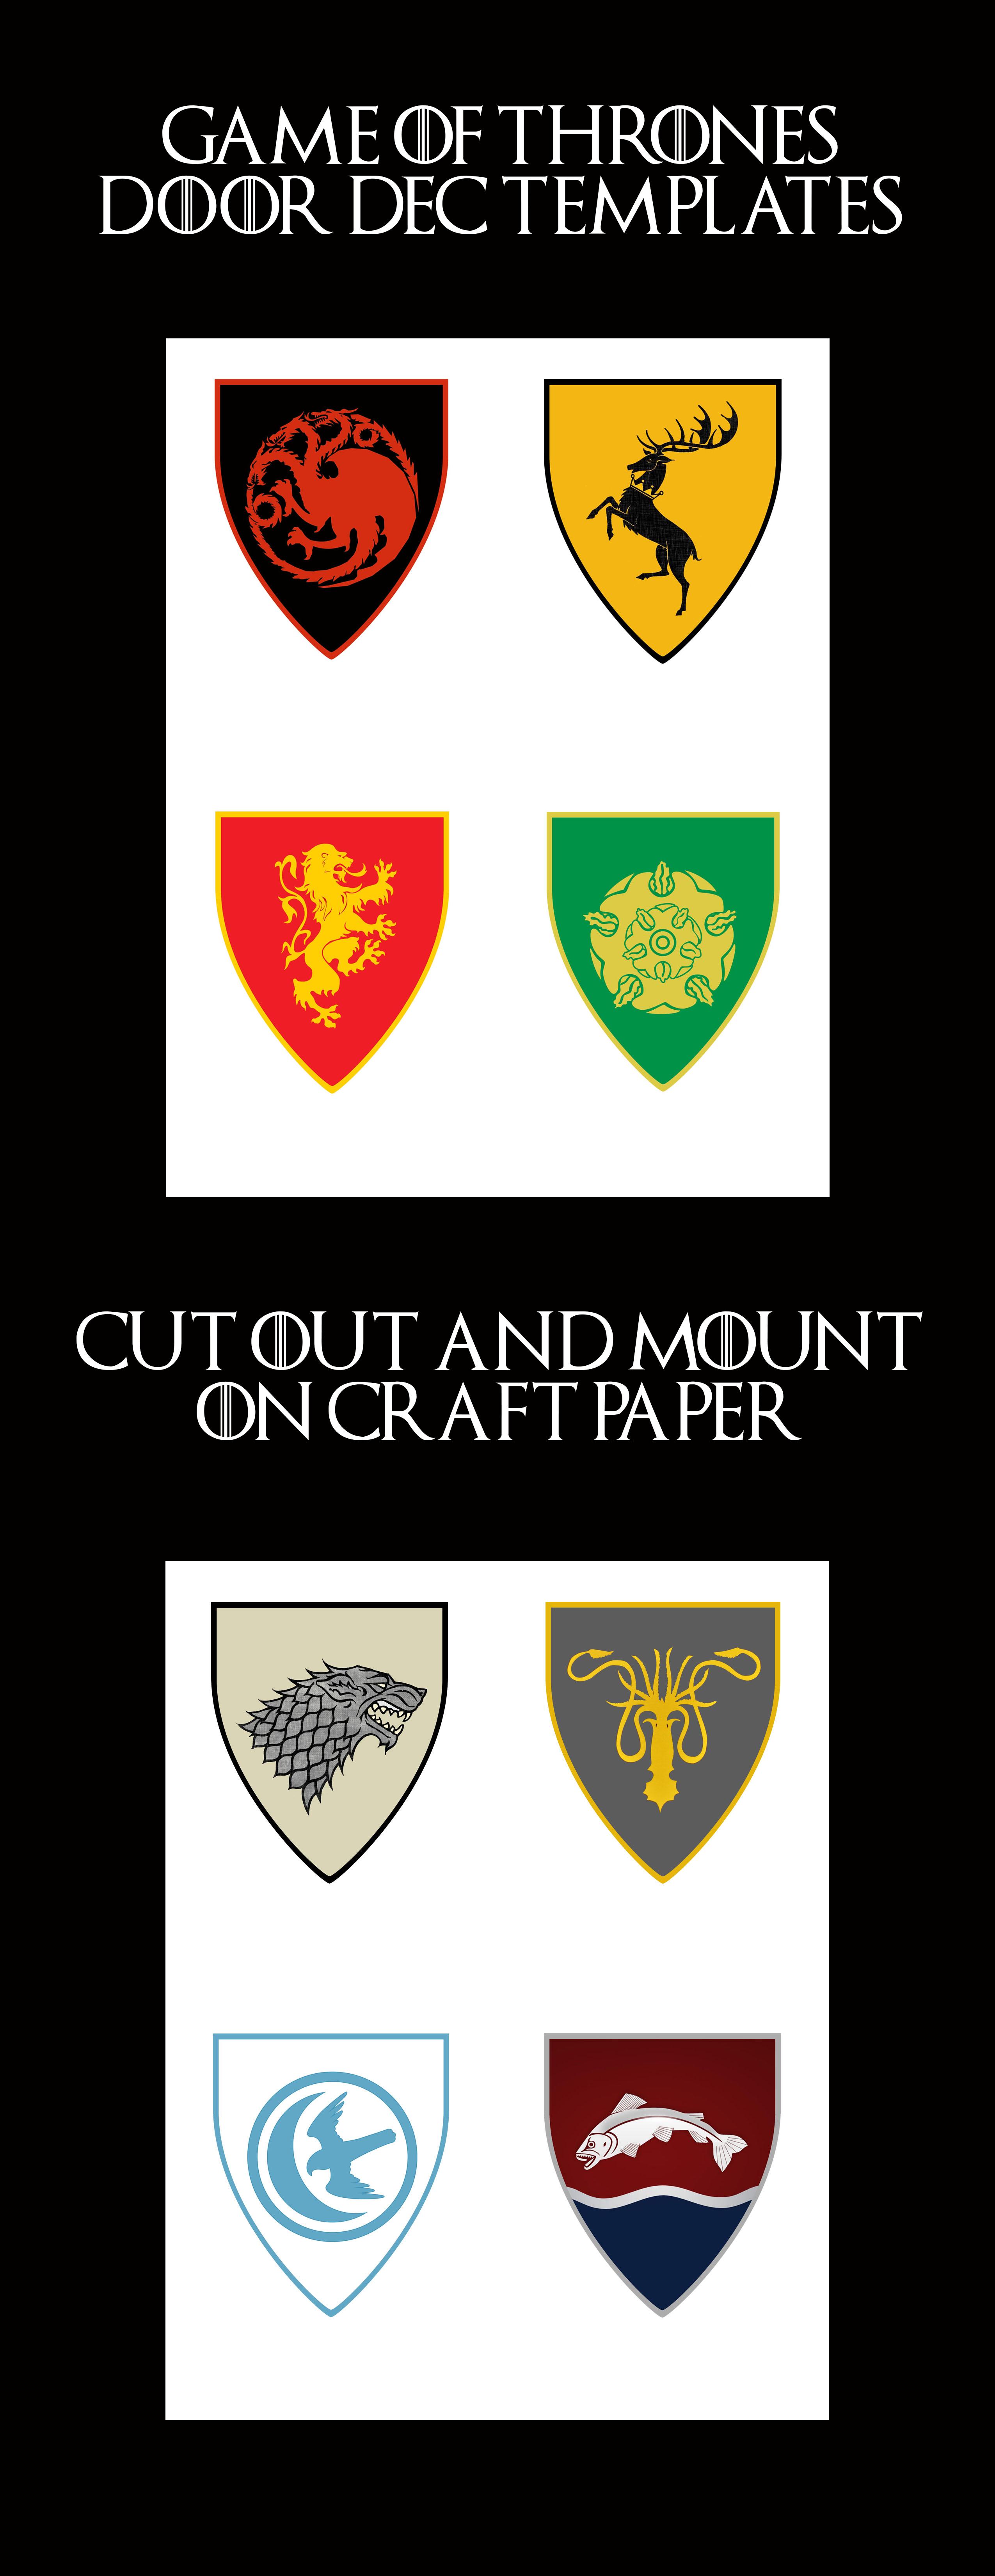 photo about Printable Door Decs Templates named Match of Thrones Home Crest Doorway Decs! Print and mount upon